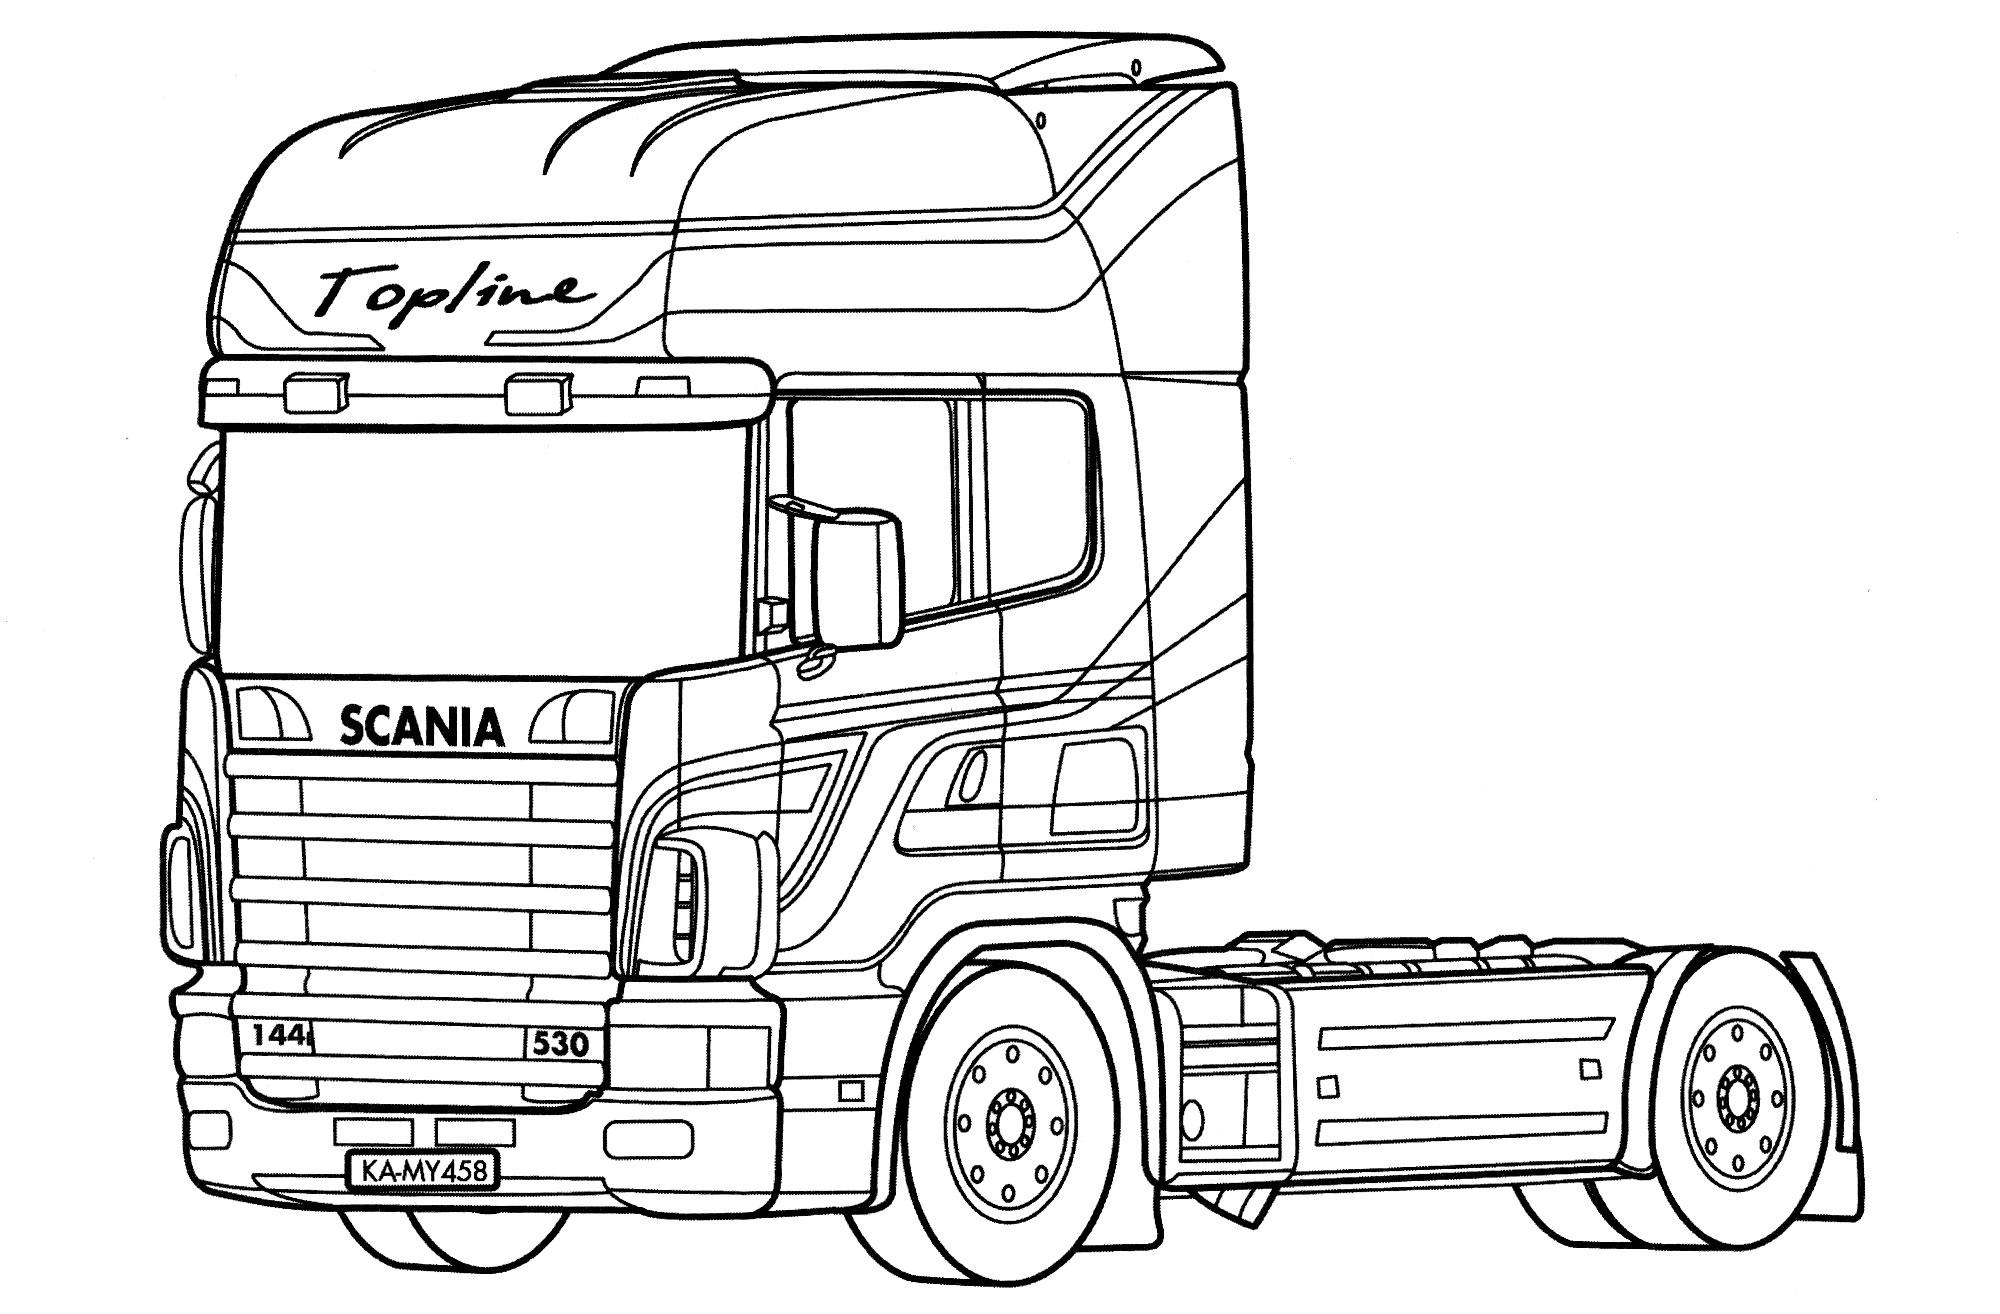 Раскраска Scania 144 Topline | Раскраски Грузовики